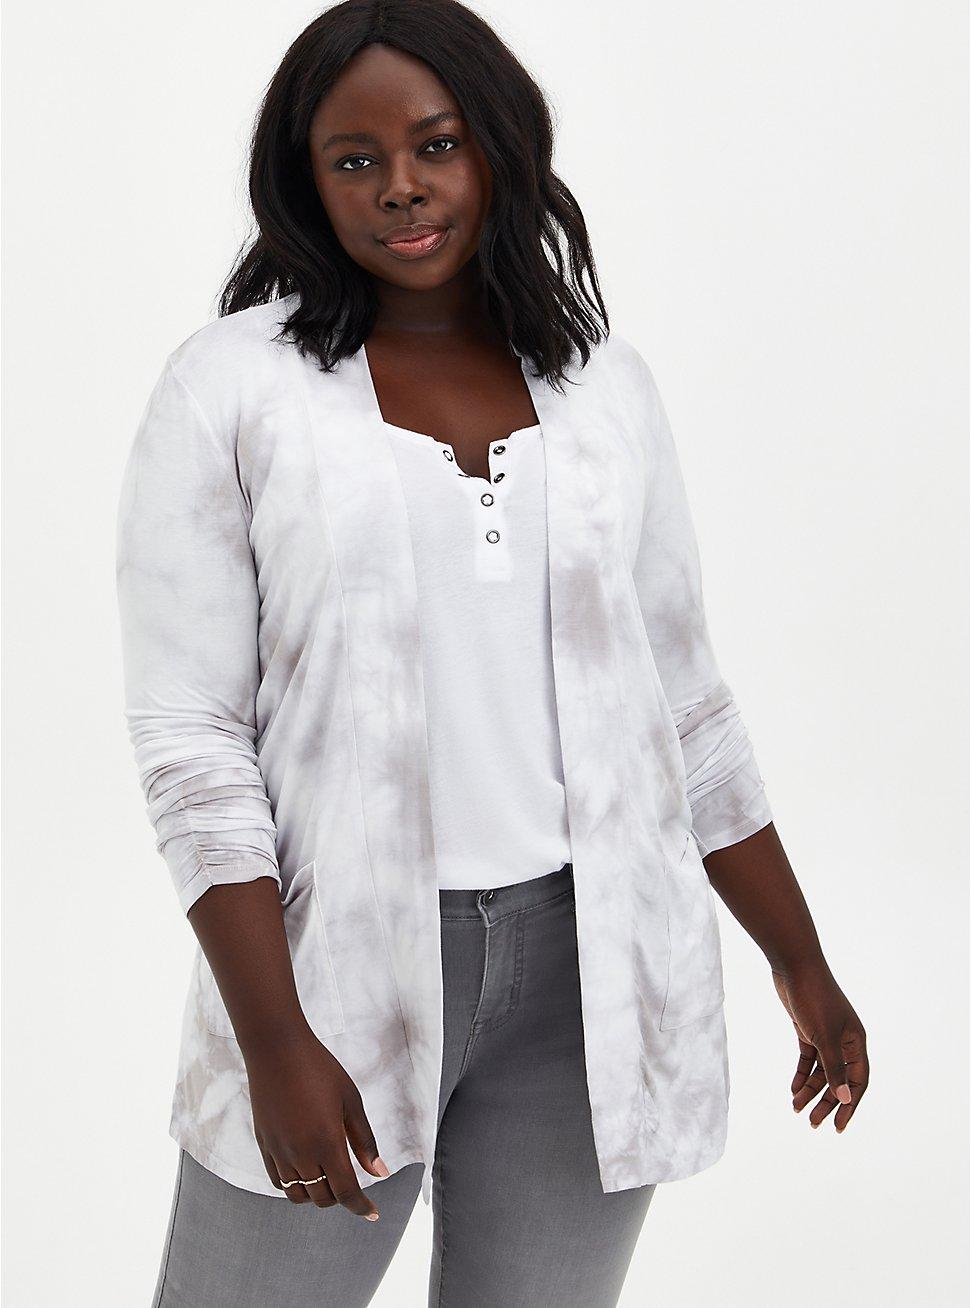 Grey Tie-Dye Super Soft Cardigan Sweater, TIE DYE, hi-res